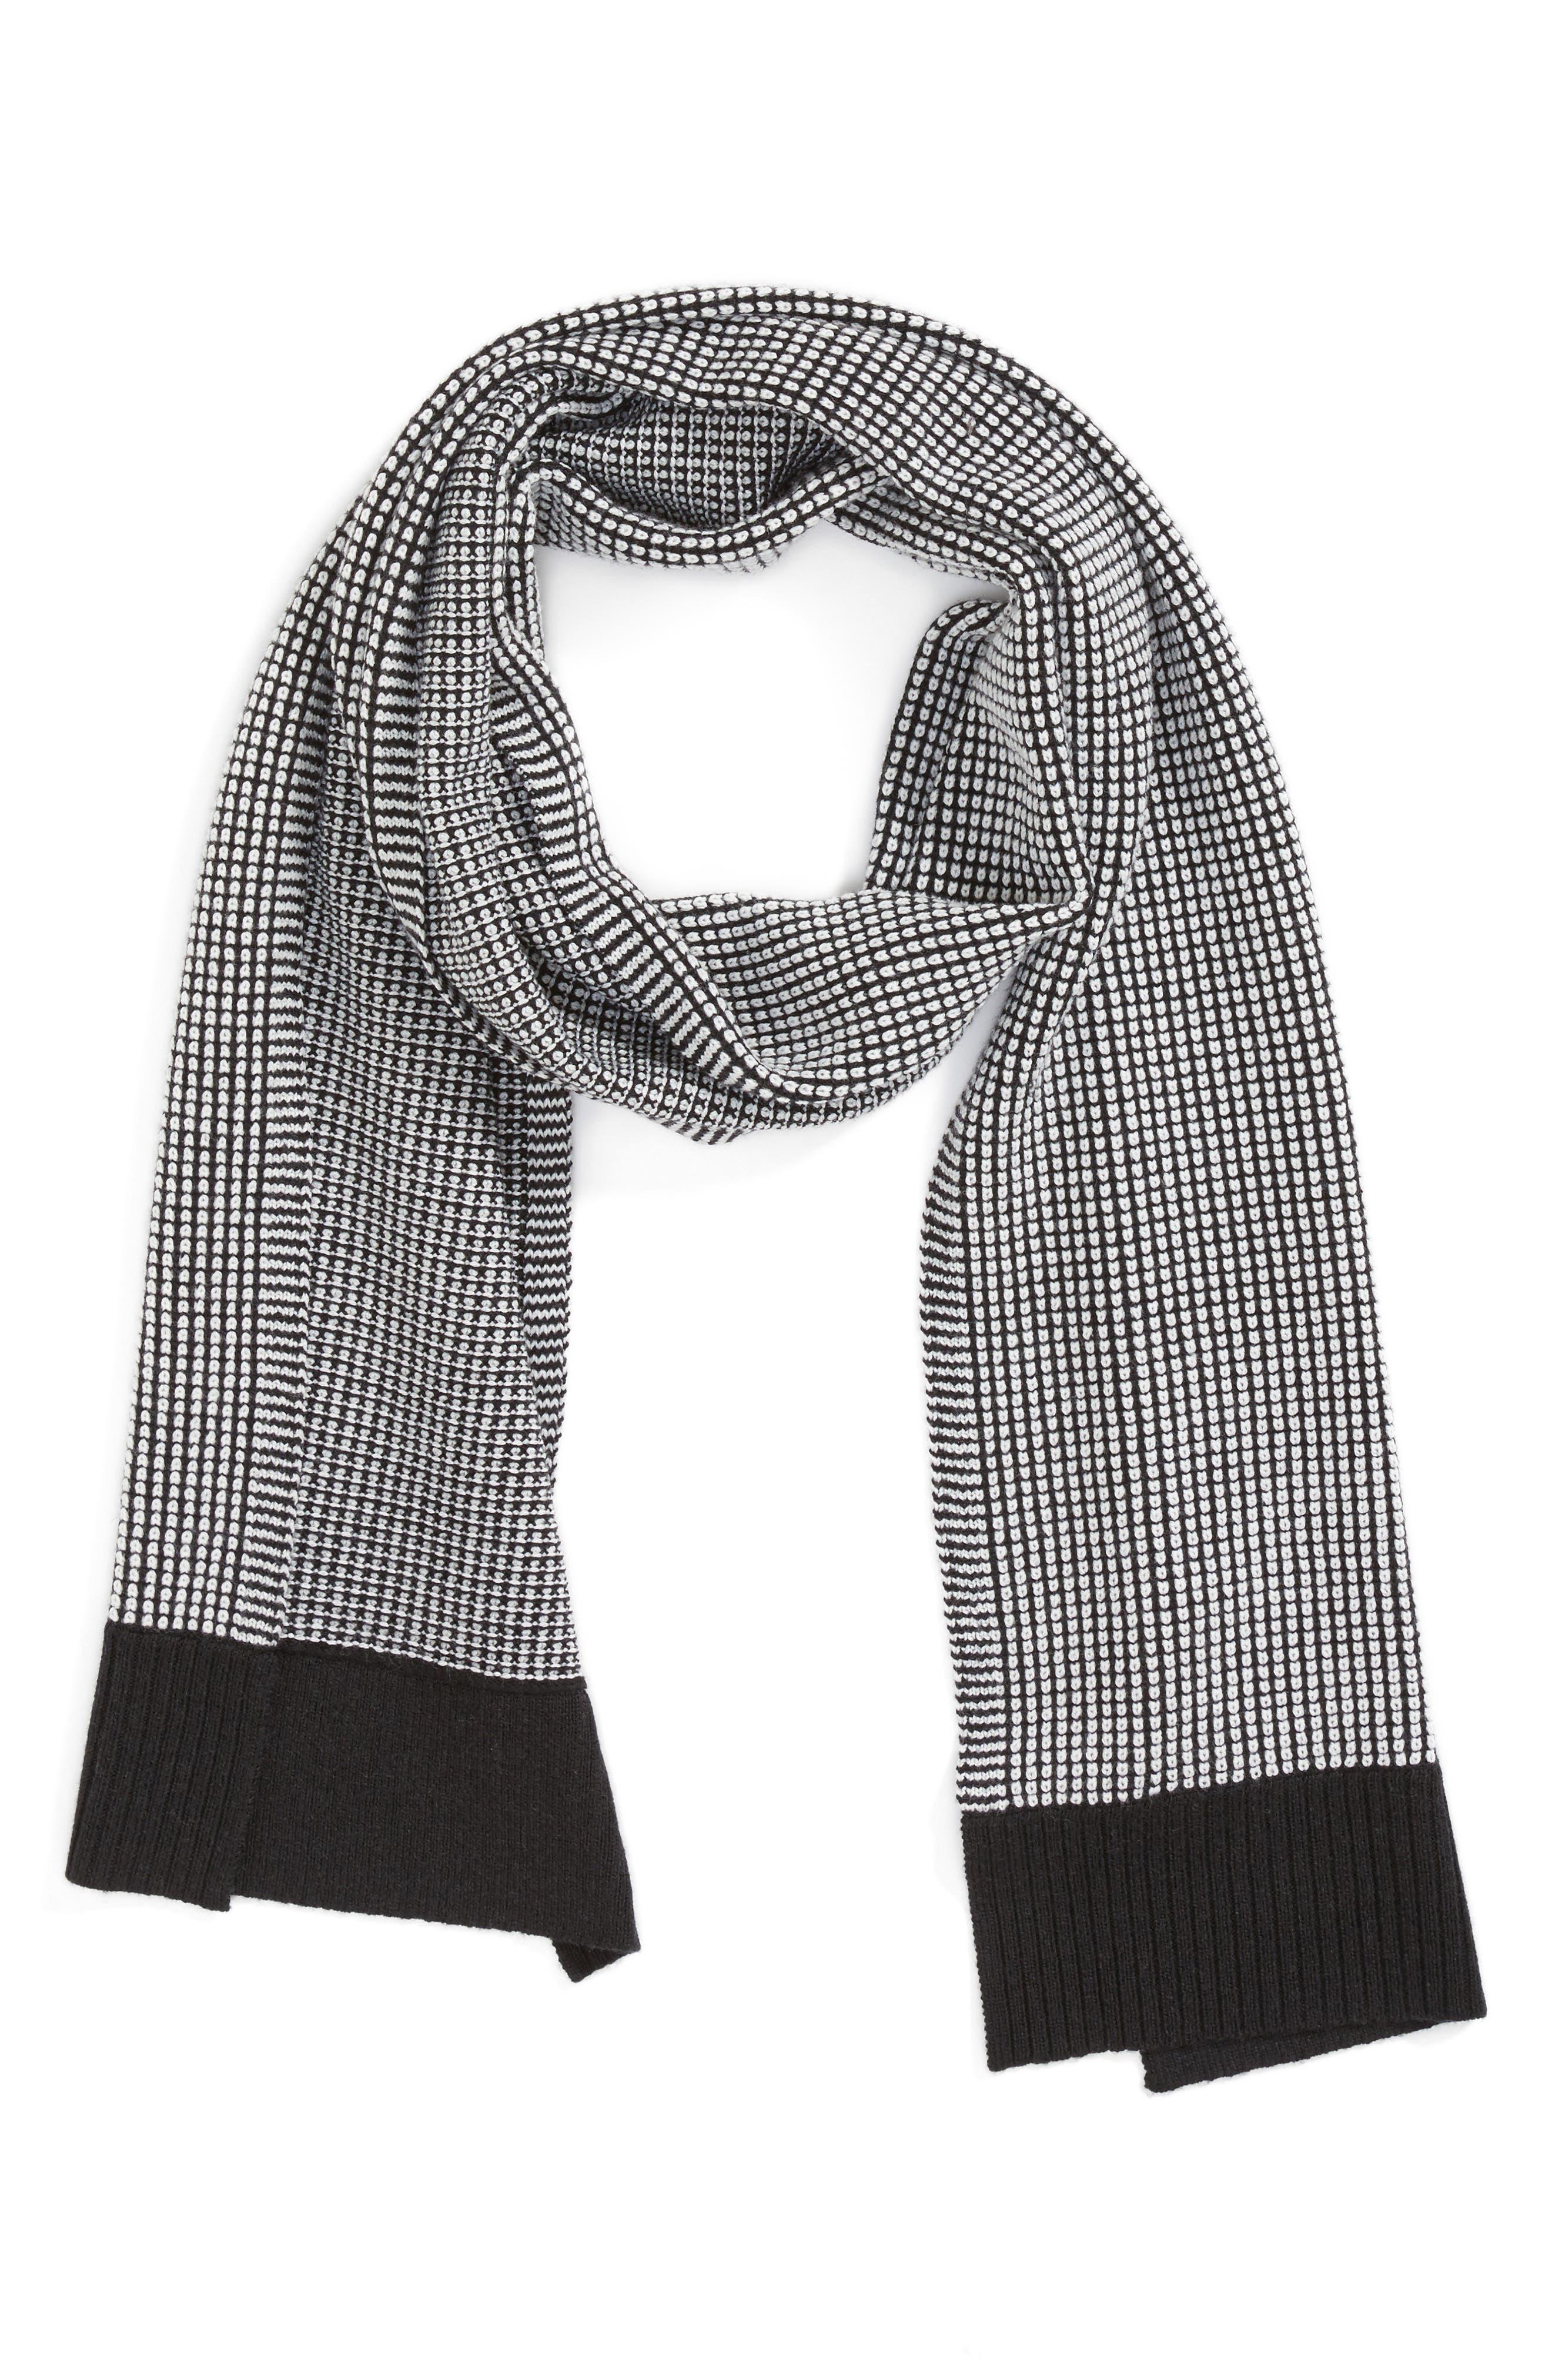 Merino Wool Scarf,                             Alternate thumbnail 3, color,                             Black/ Soft White